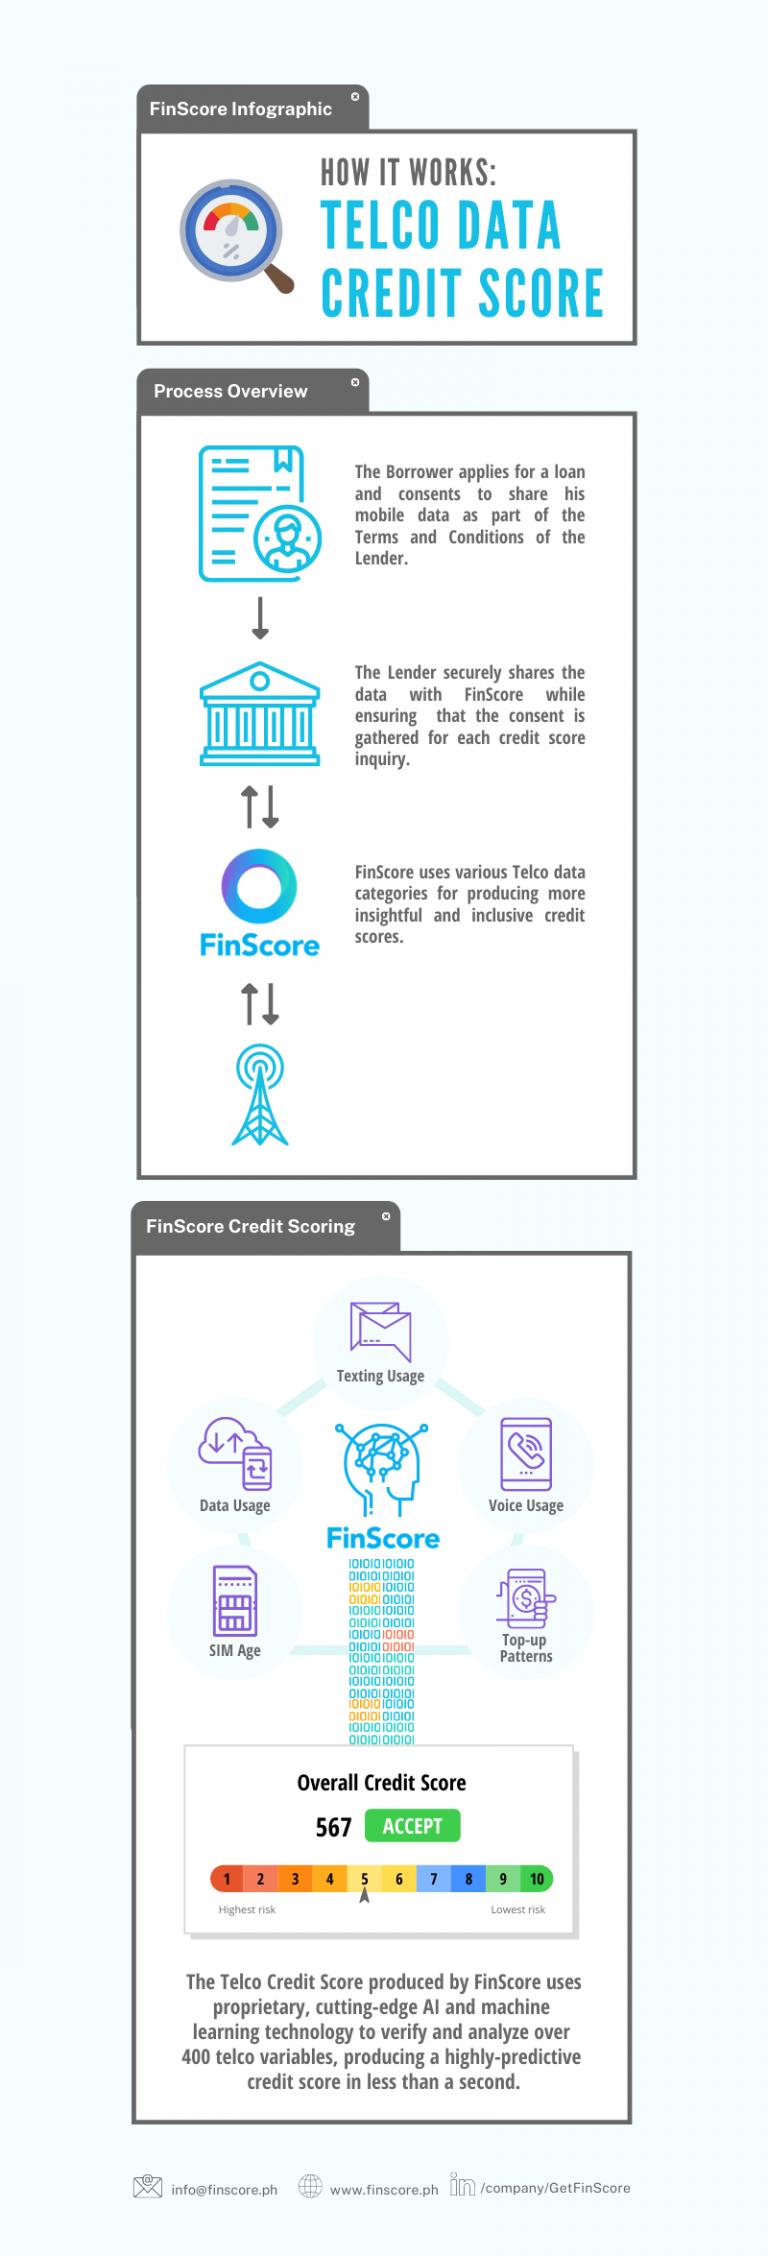 FinScore Infographic_How Alternative Data Credit Scoring Works